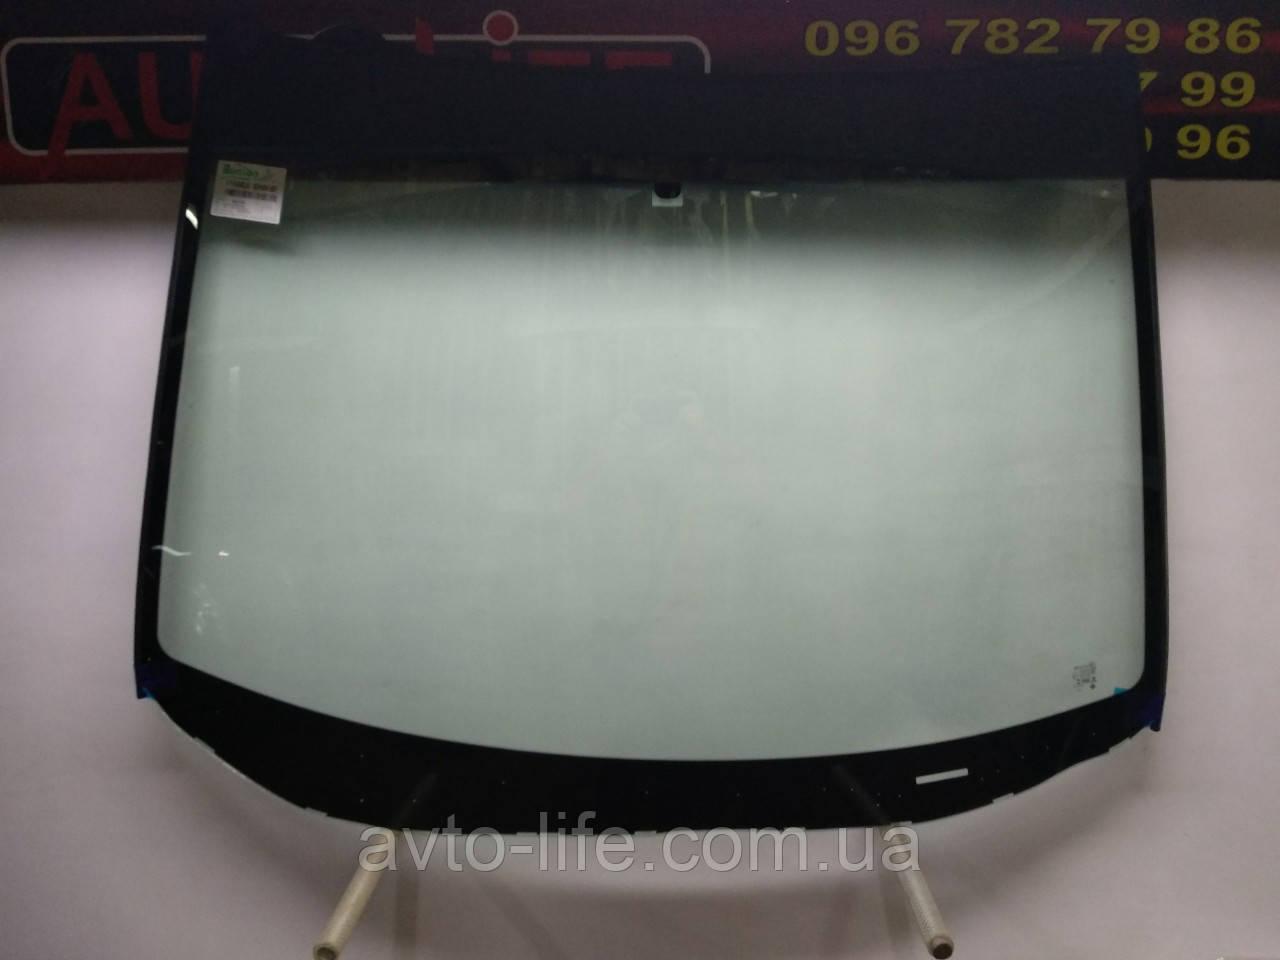 Лобовое стеклоMazda CX7 (2006-2012)| автостекло Мазда СХ7 | лобове скло Мазда СХ7 | Заміна 450 грн